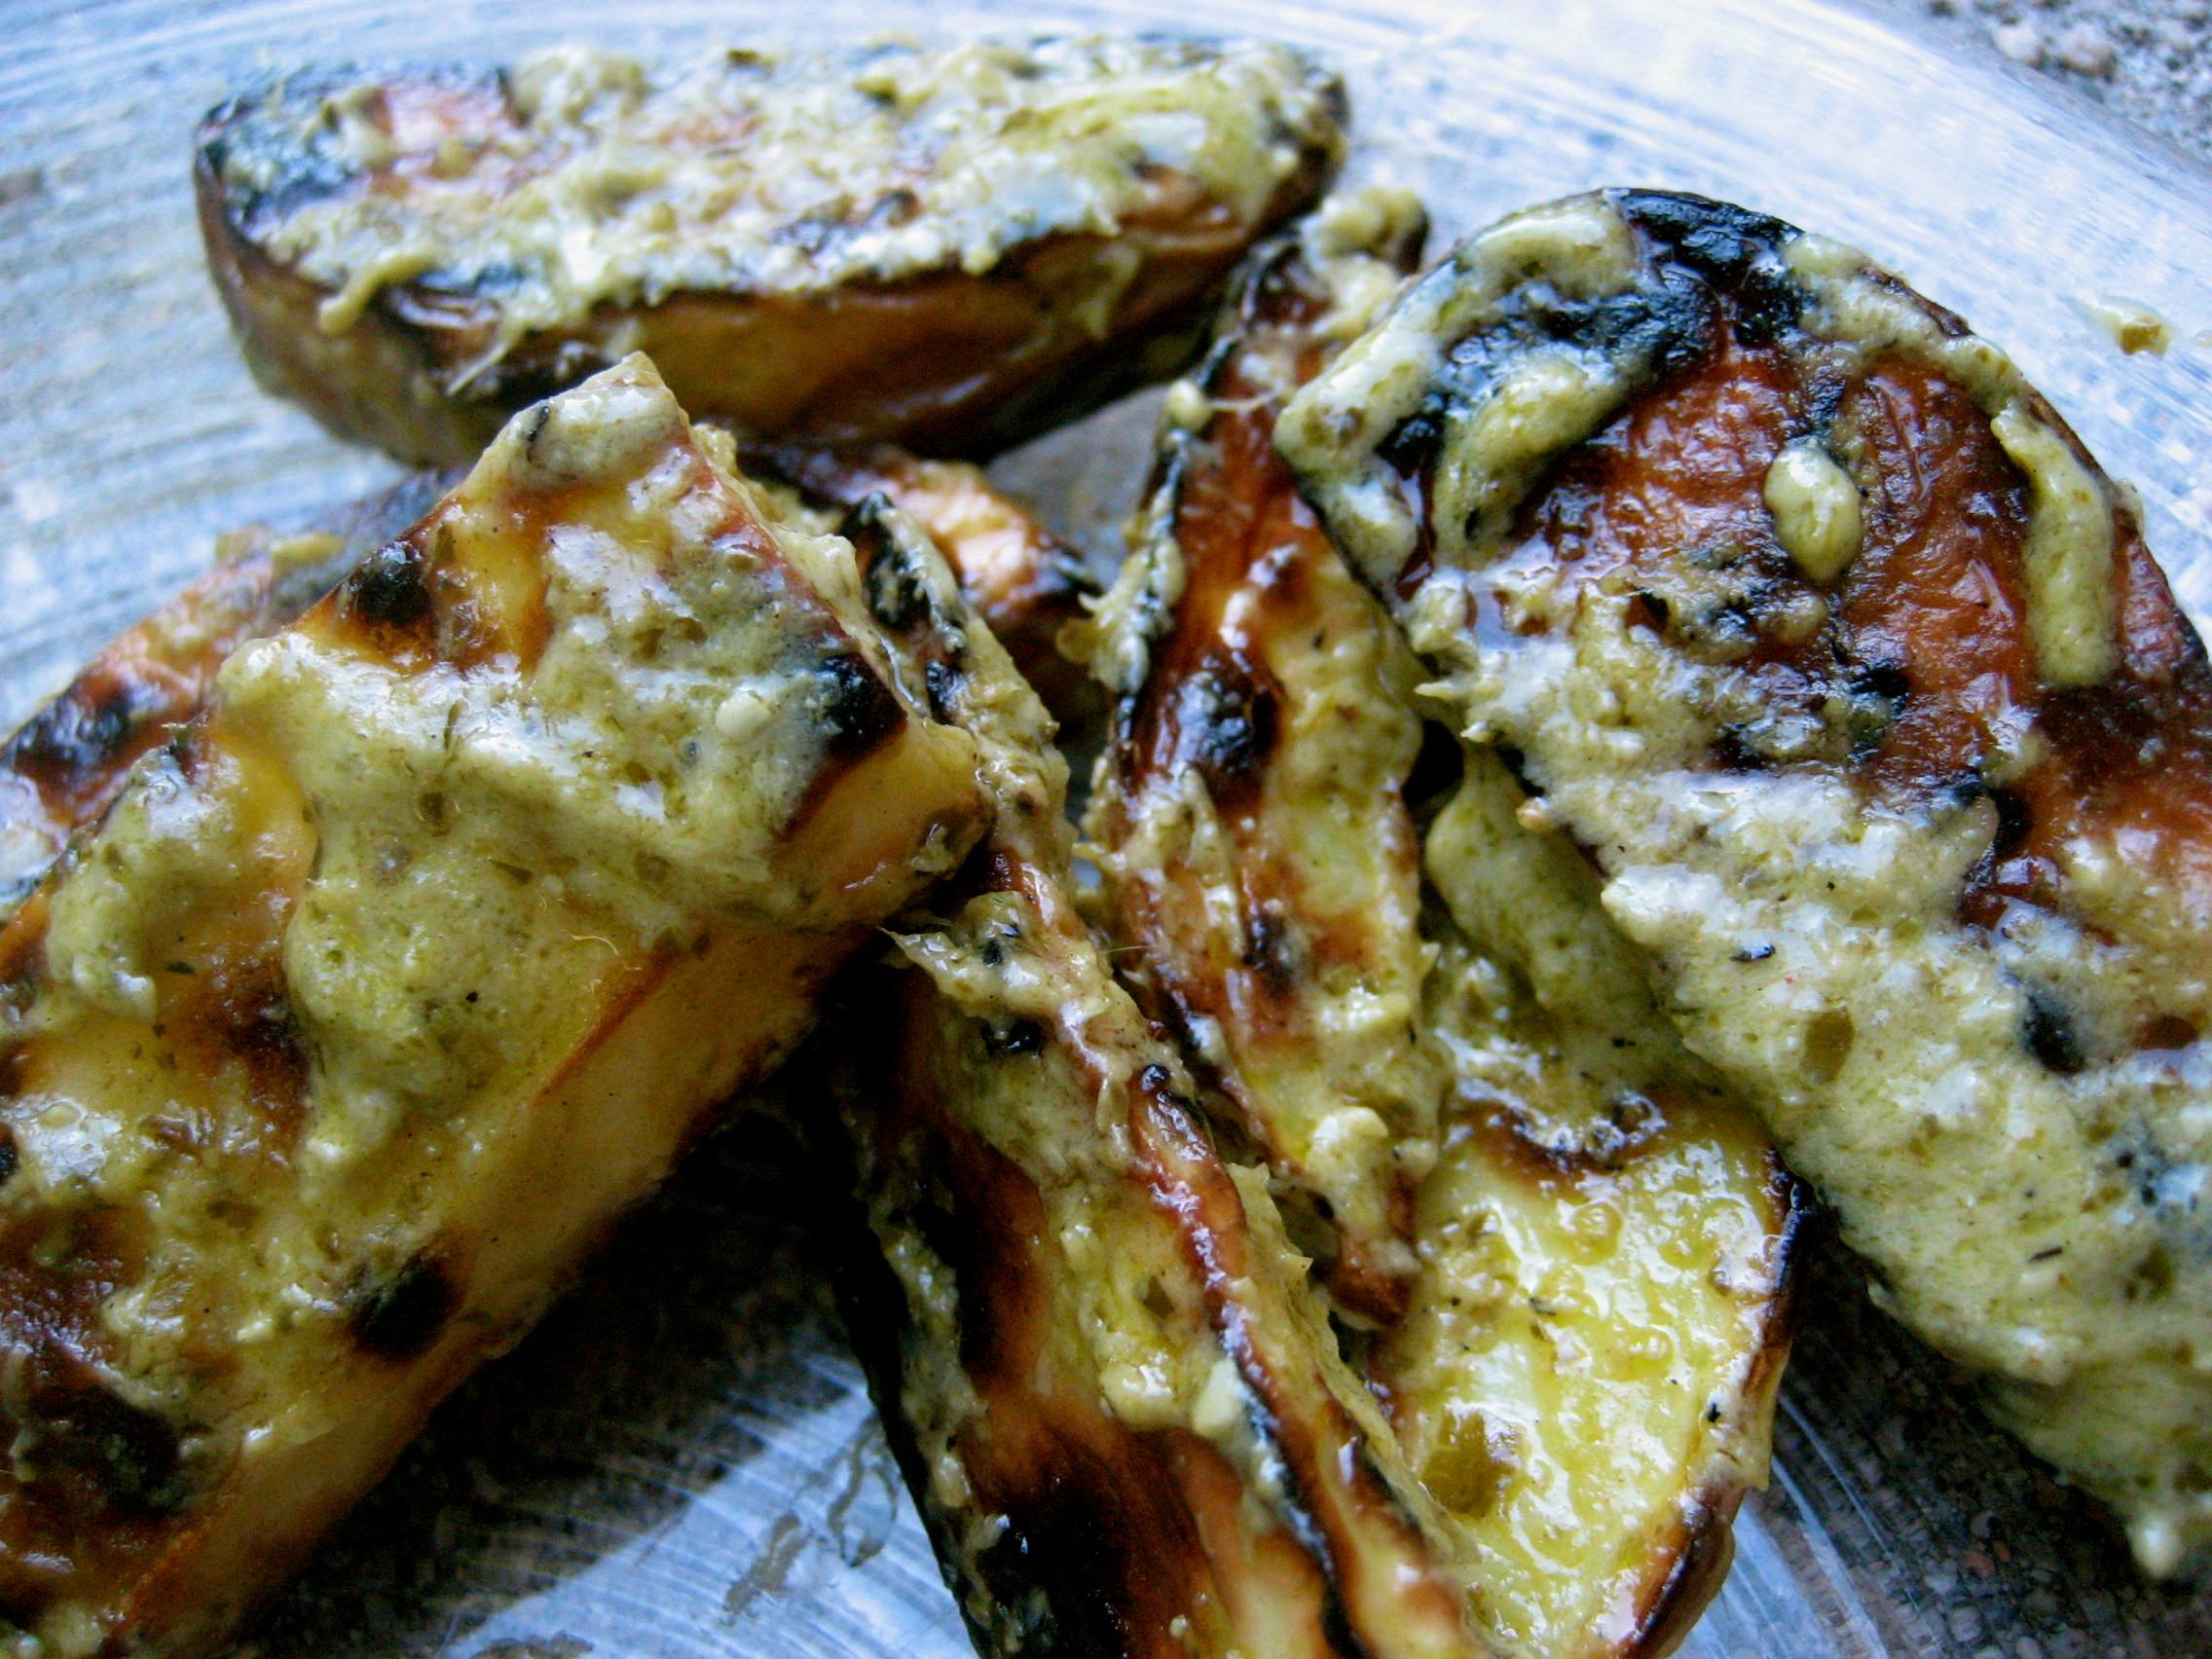 Grilled Pesto Potato Salad Recipe on Food52